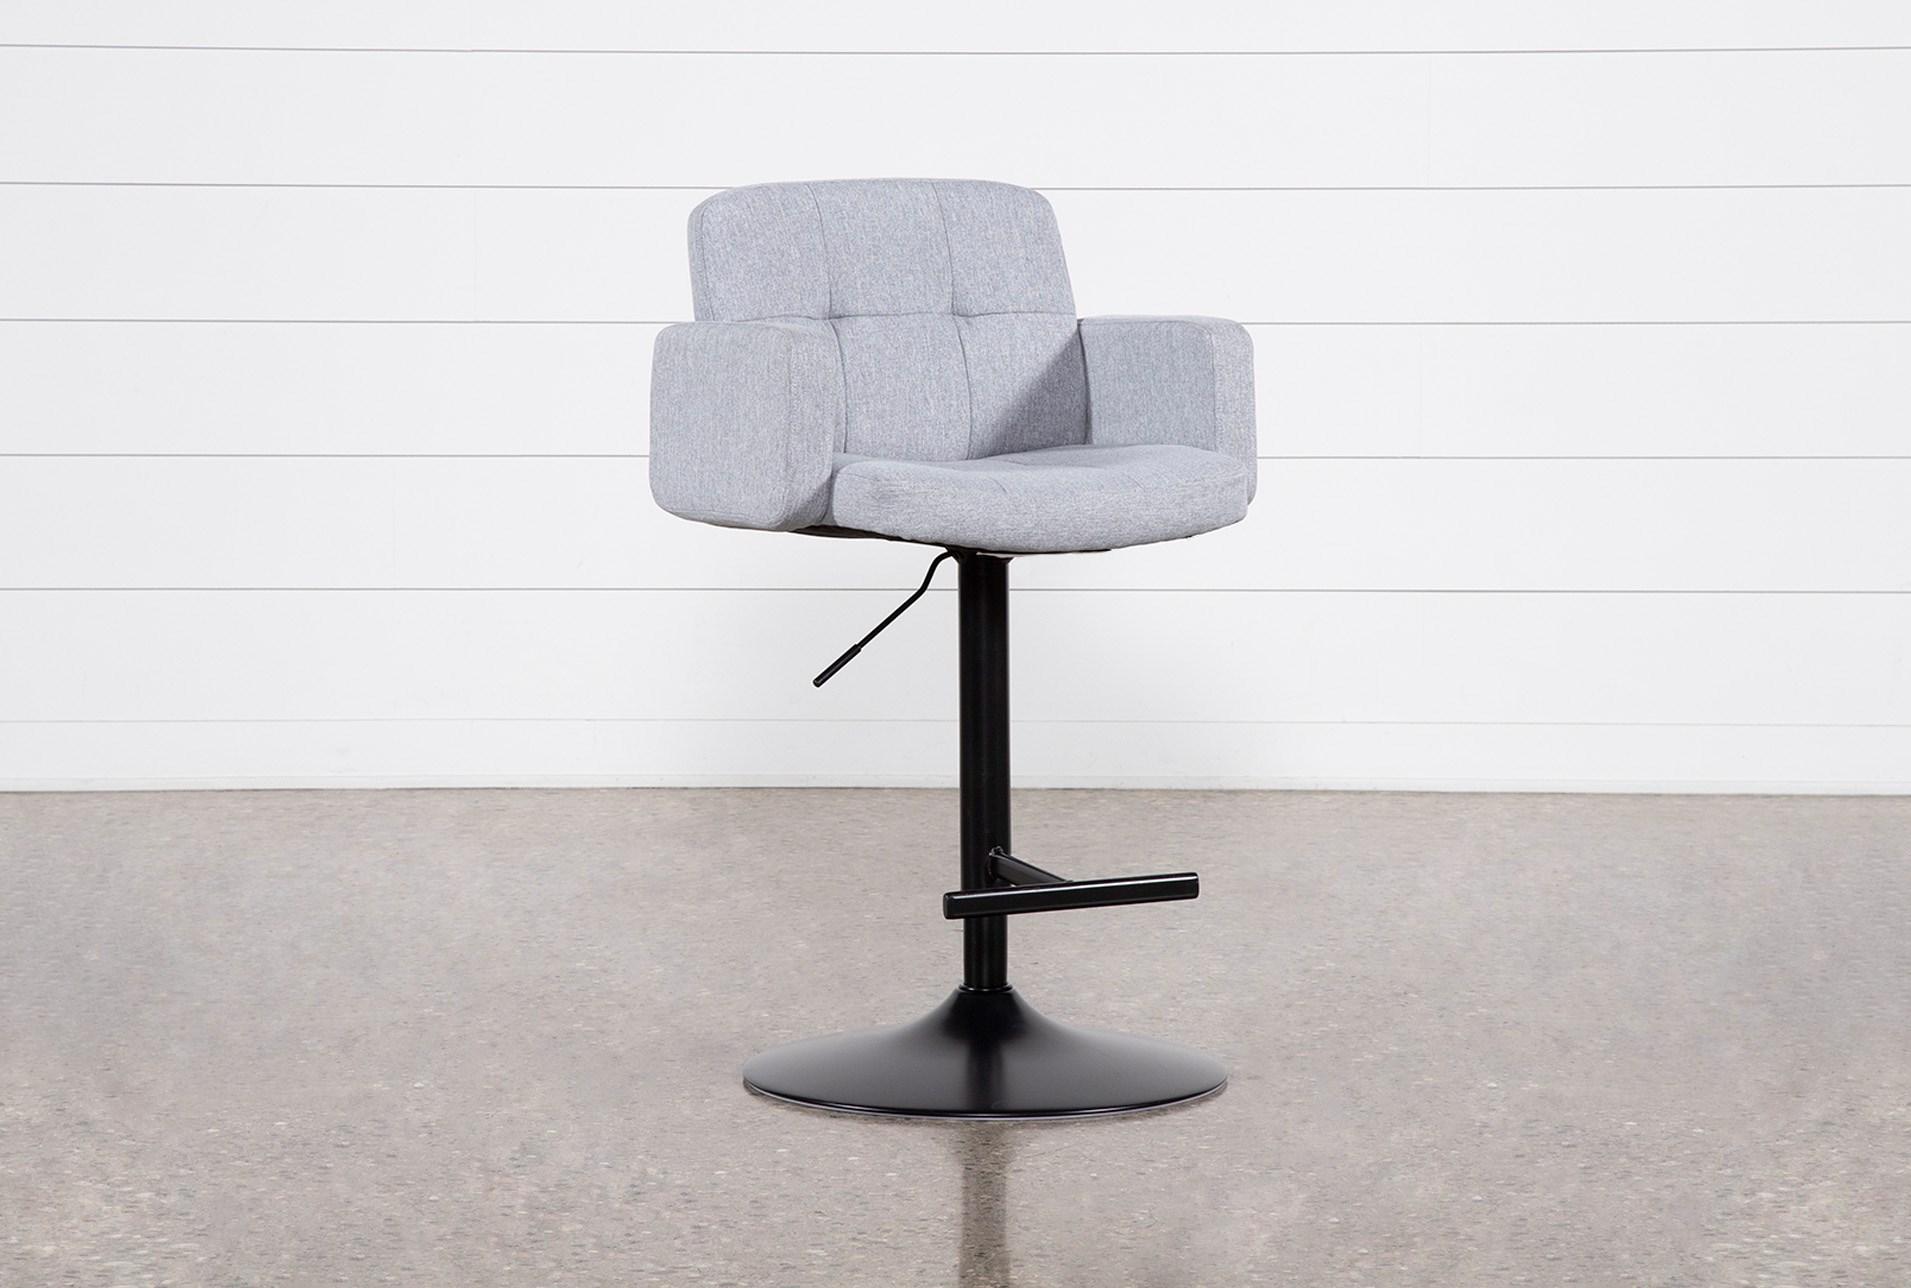 Incredible Annya Grey 31 Inch Adjustable Bar Stool Andrewgaddart Wooden Chair Designs For Living Room Andrewgaddartcom